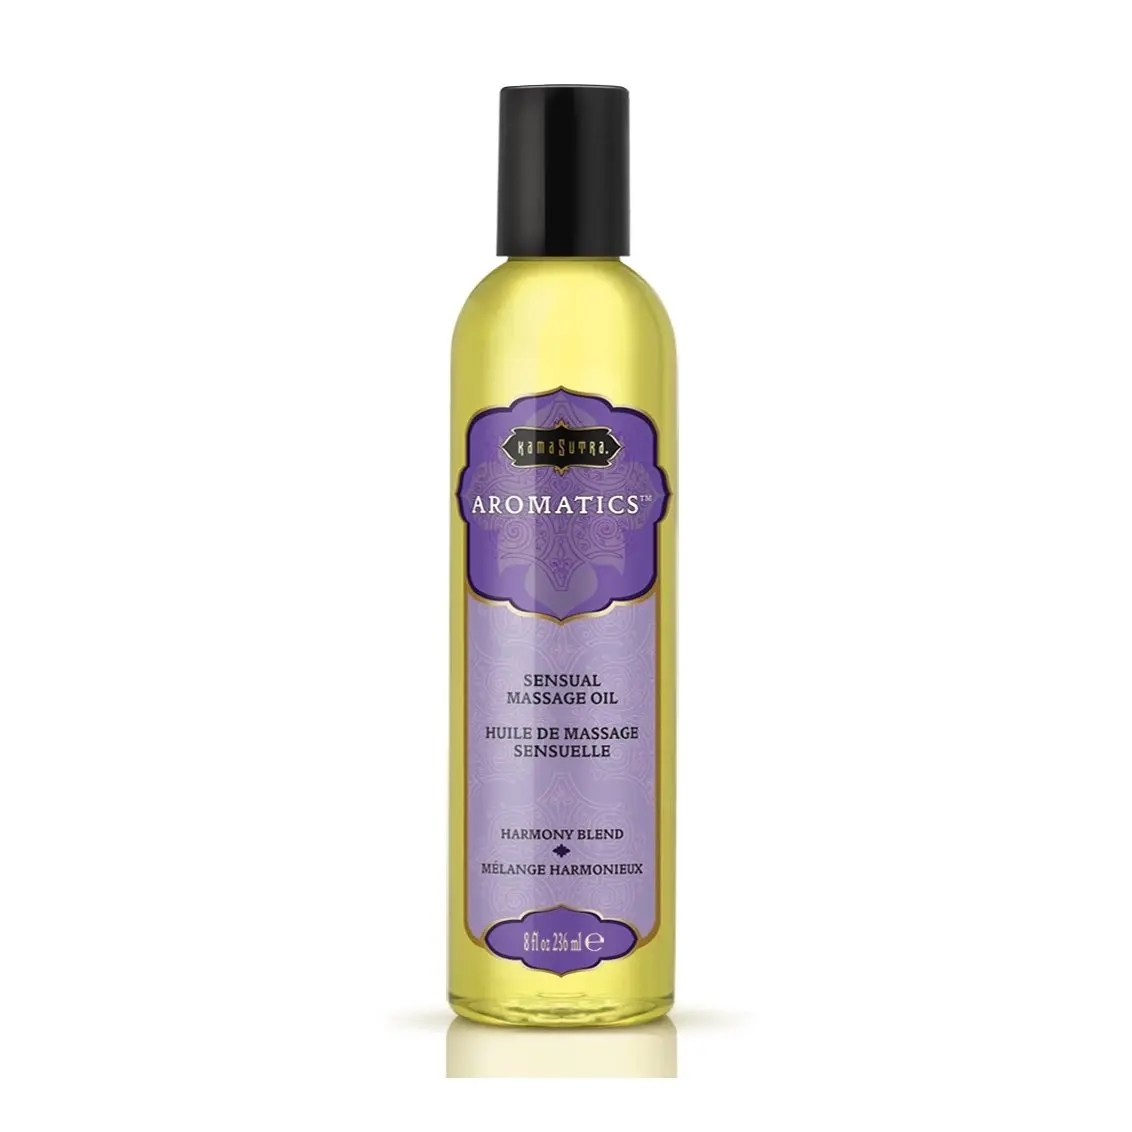 Kama Sutra Aromatic Massage Oil 8oz Harmony Blend